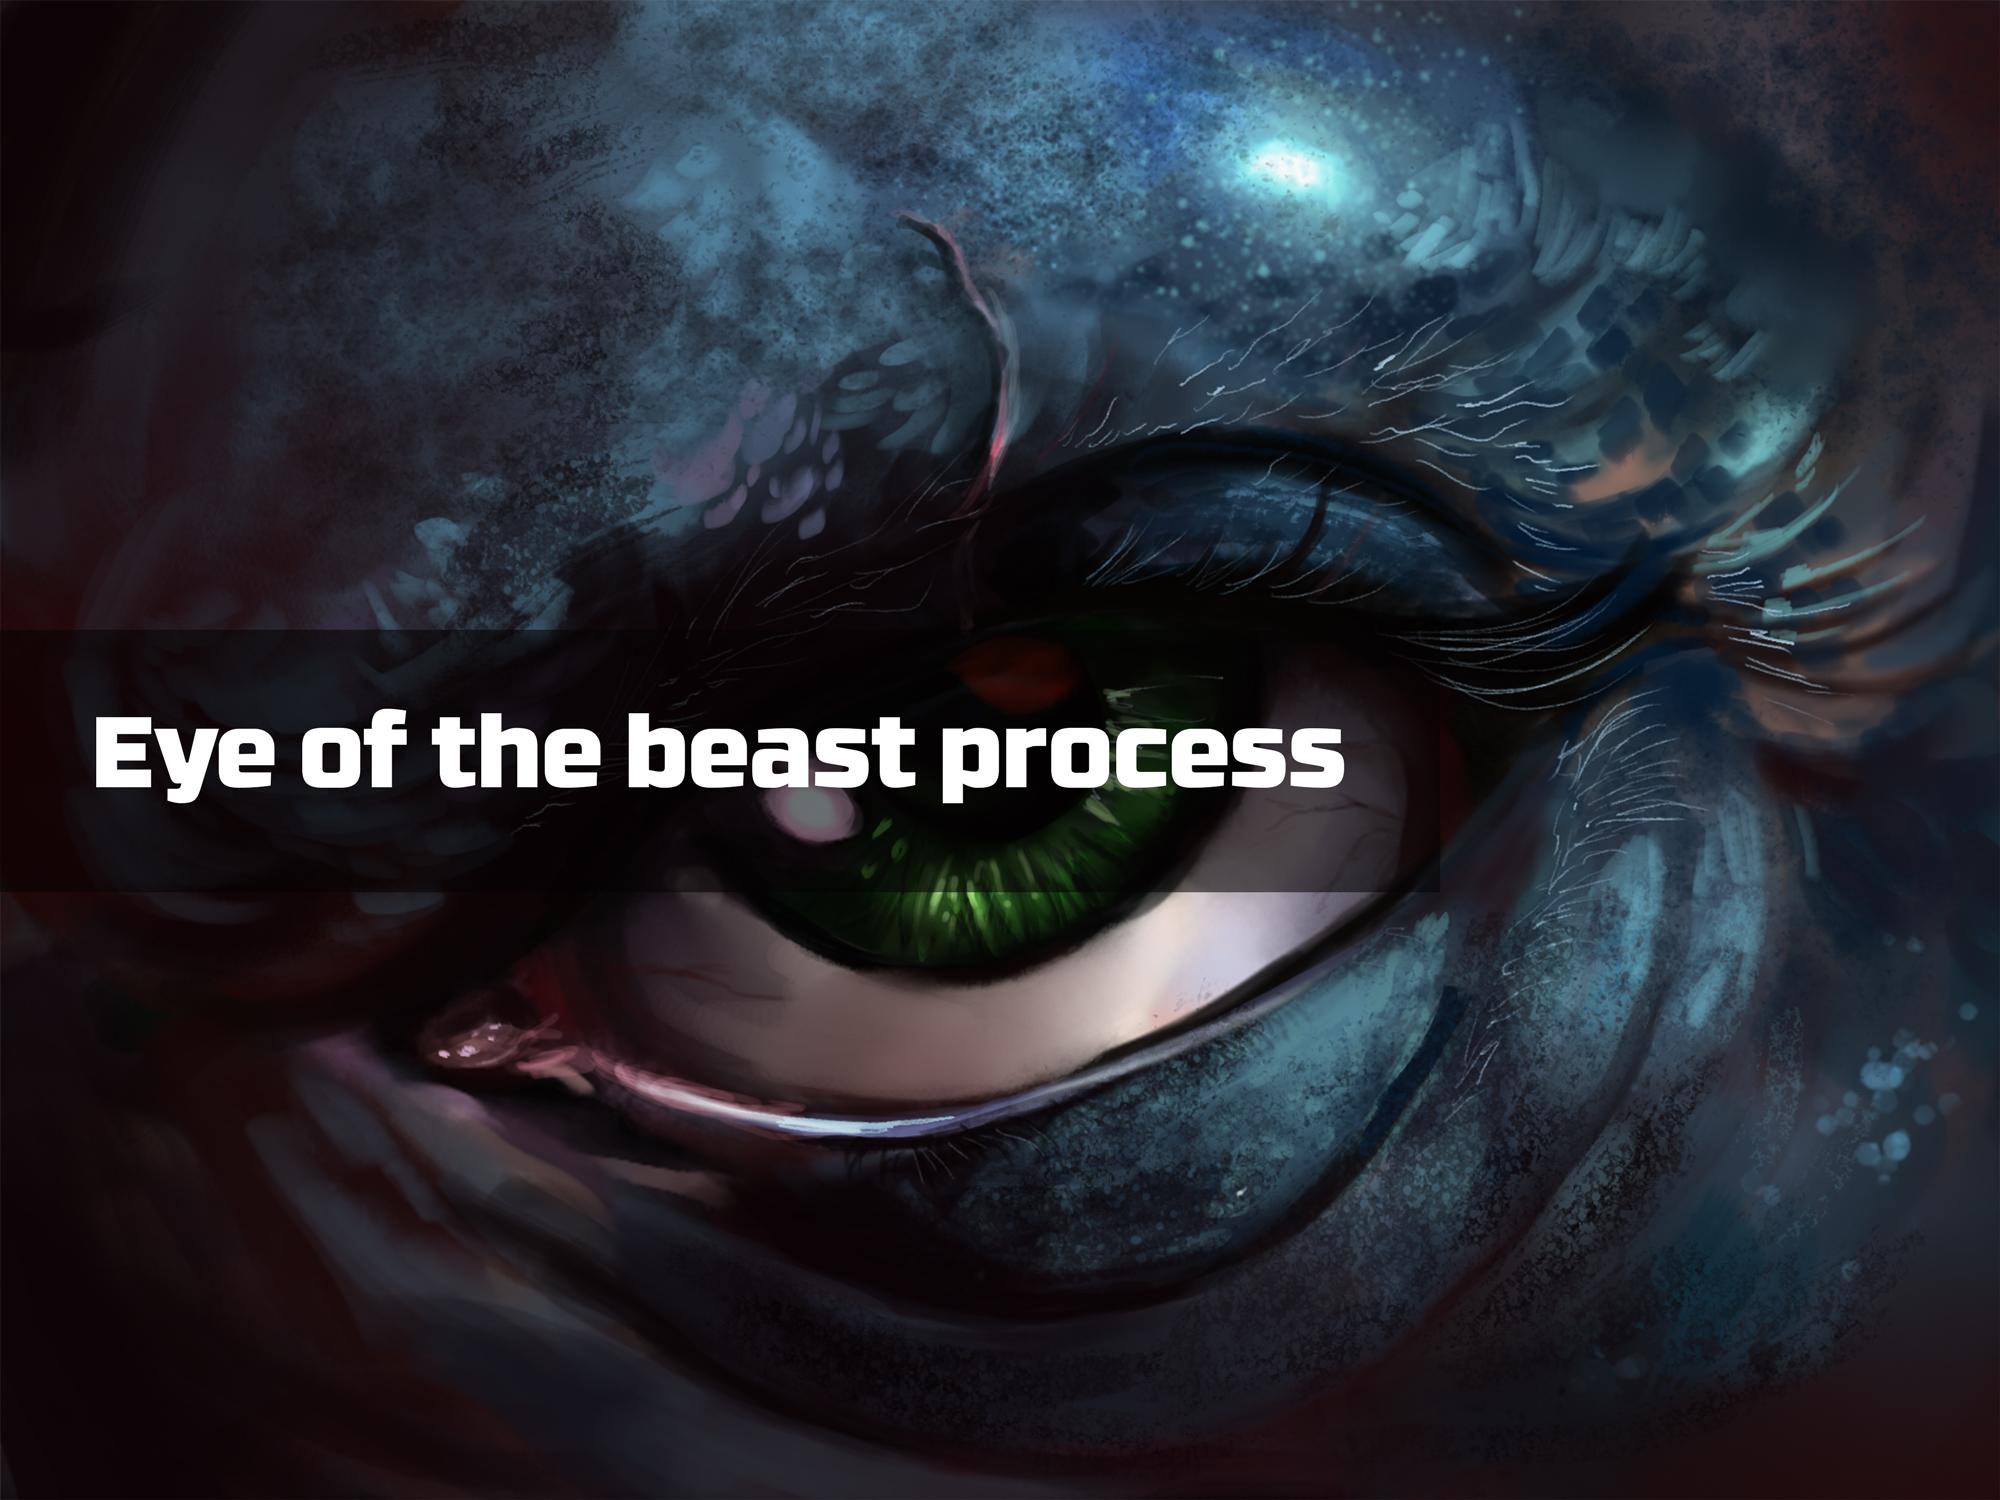 Eye-of-the-beast-cover.jpg